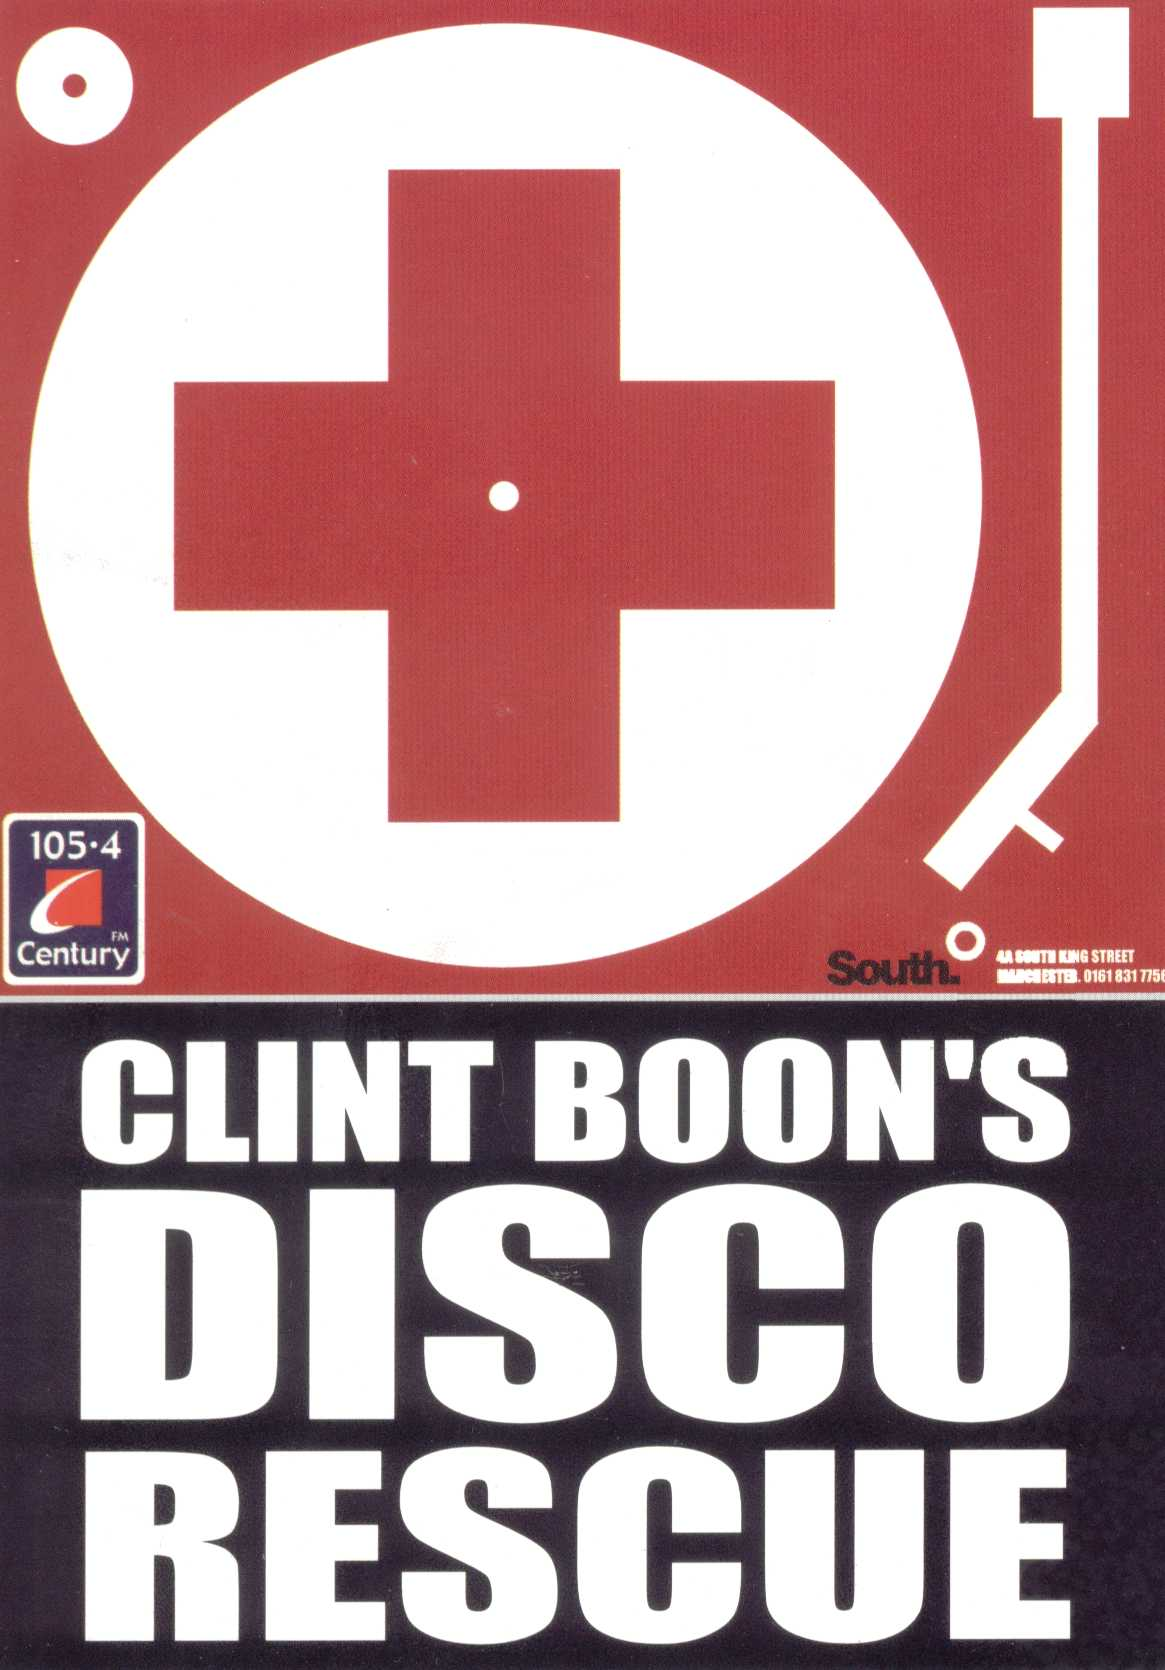 ClintBoon